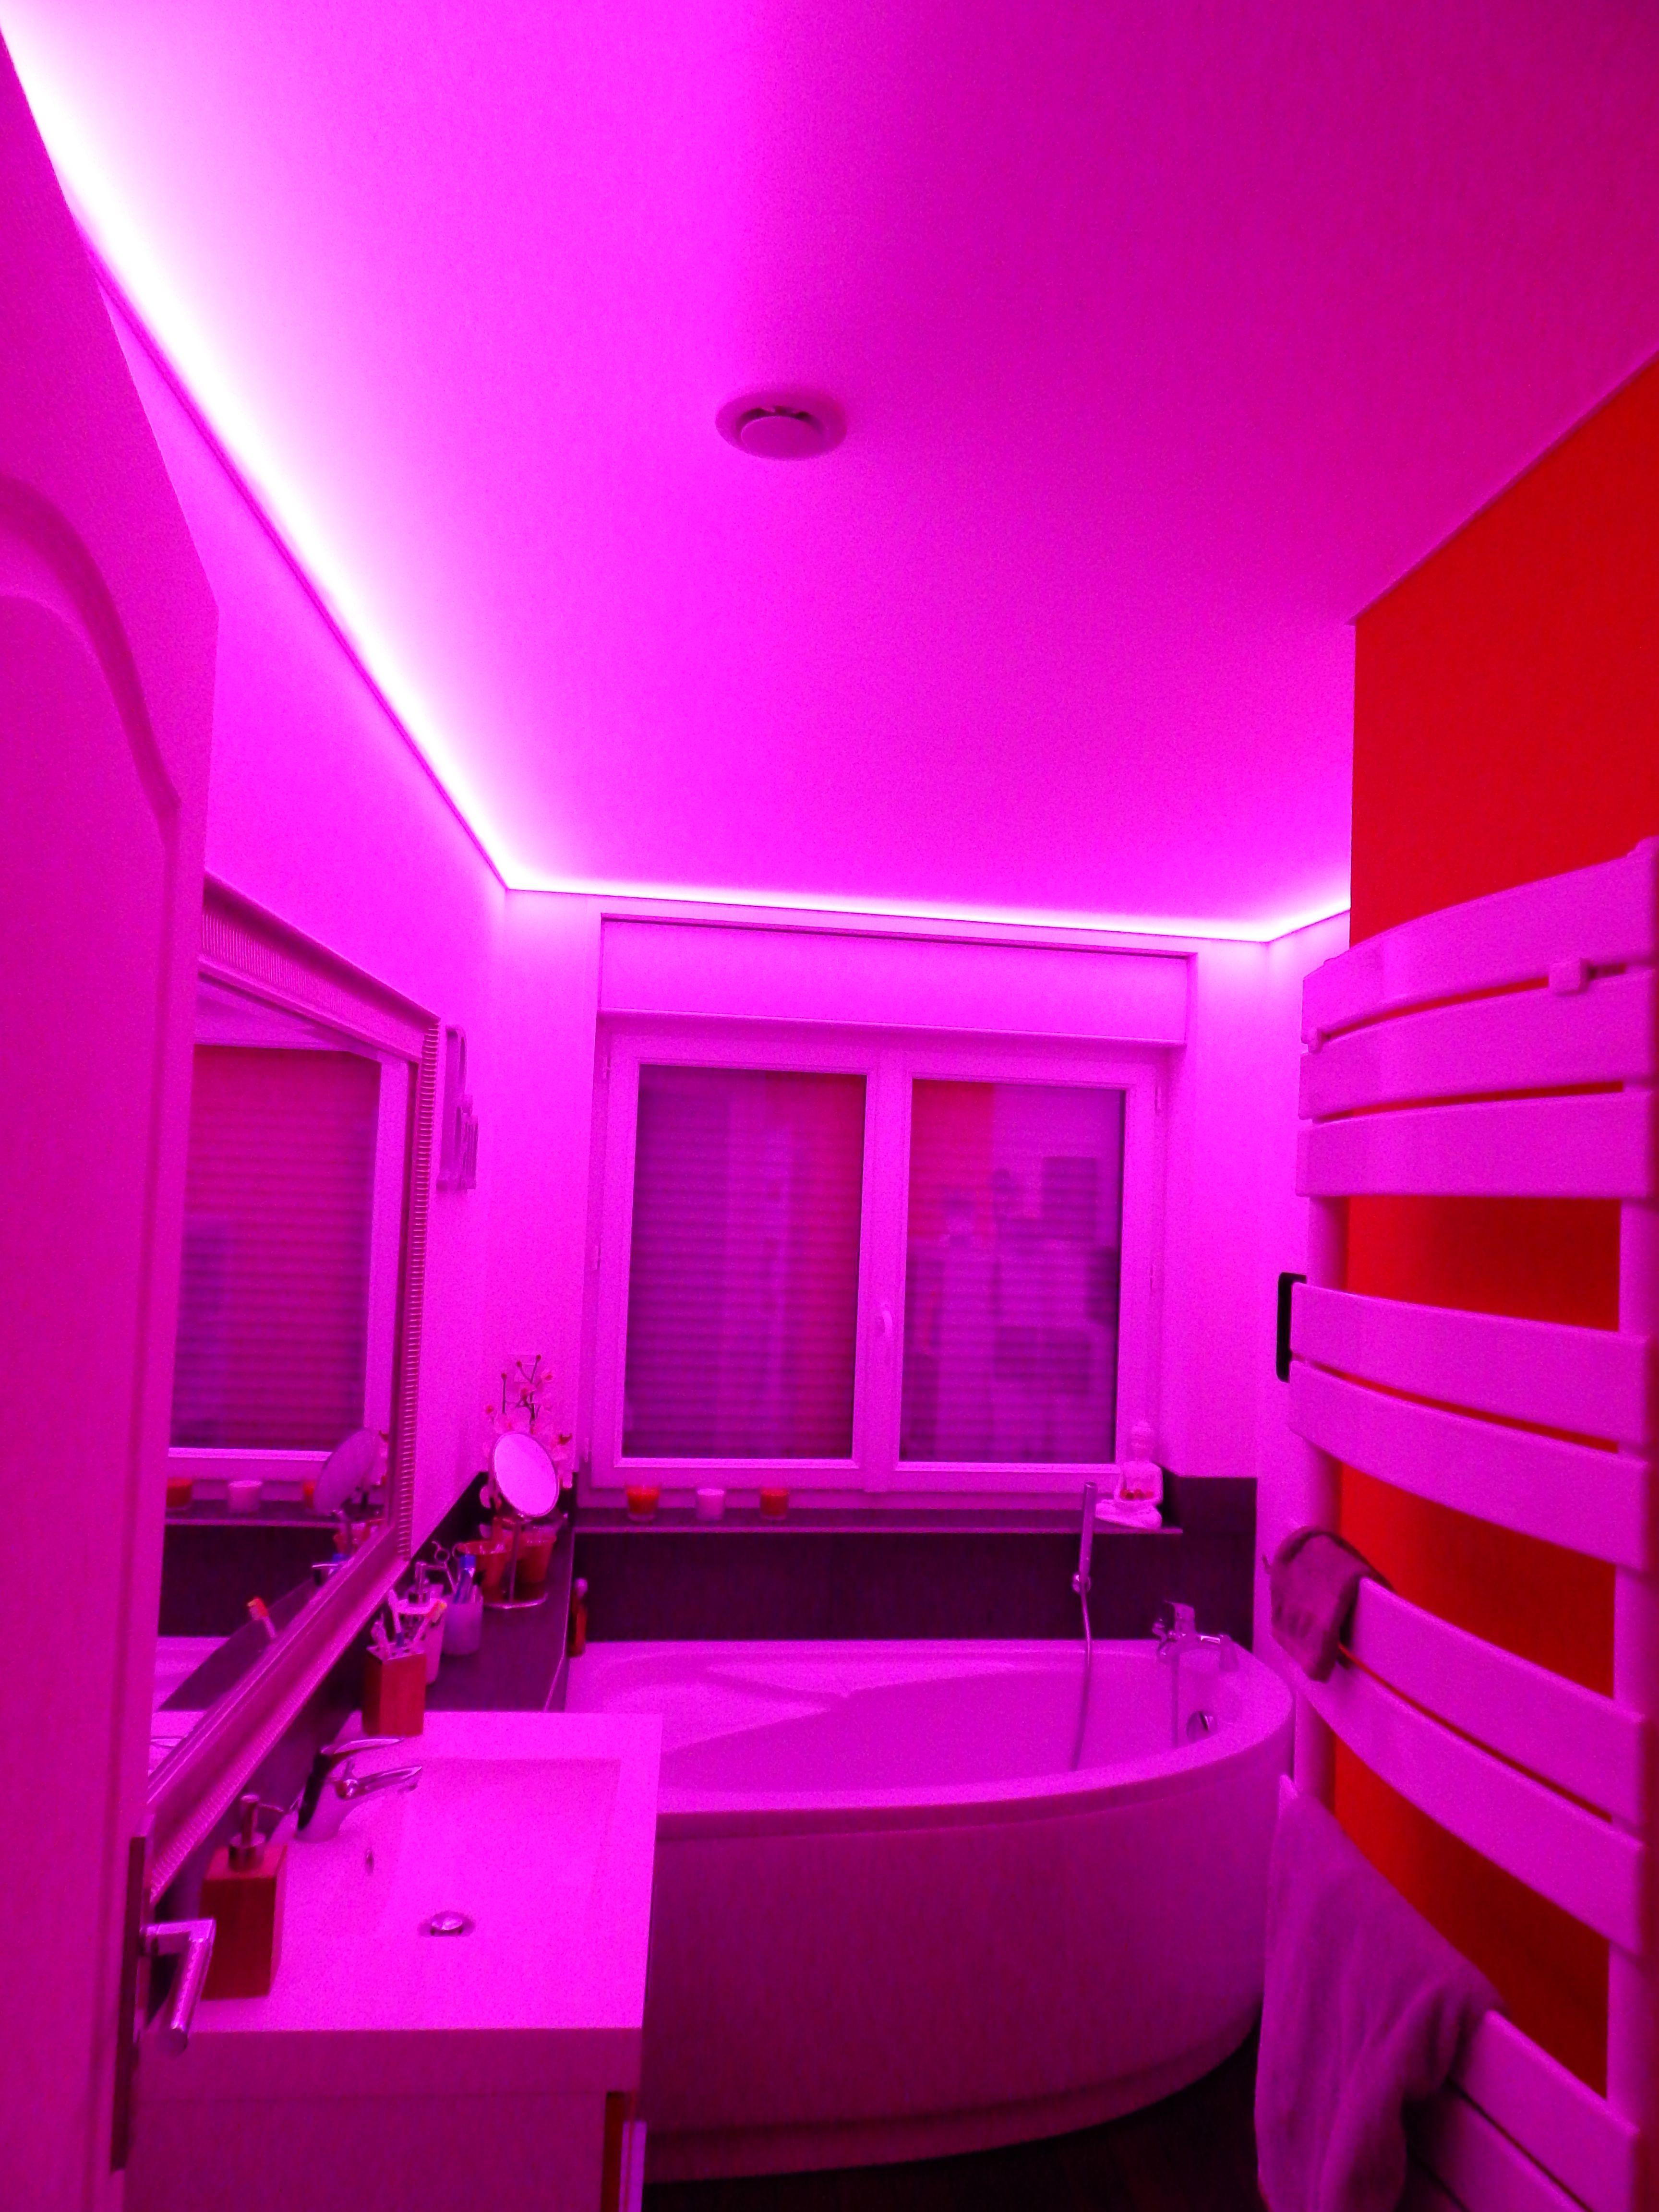 Baddie Bedroom Aesthetic Bedroom Led Lights For Room Homyracks